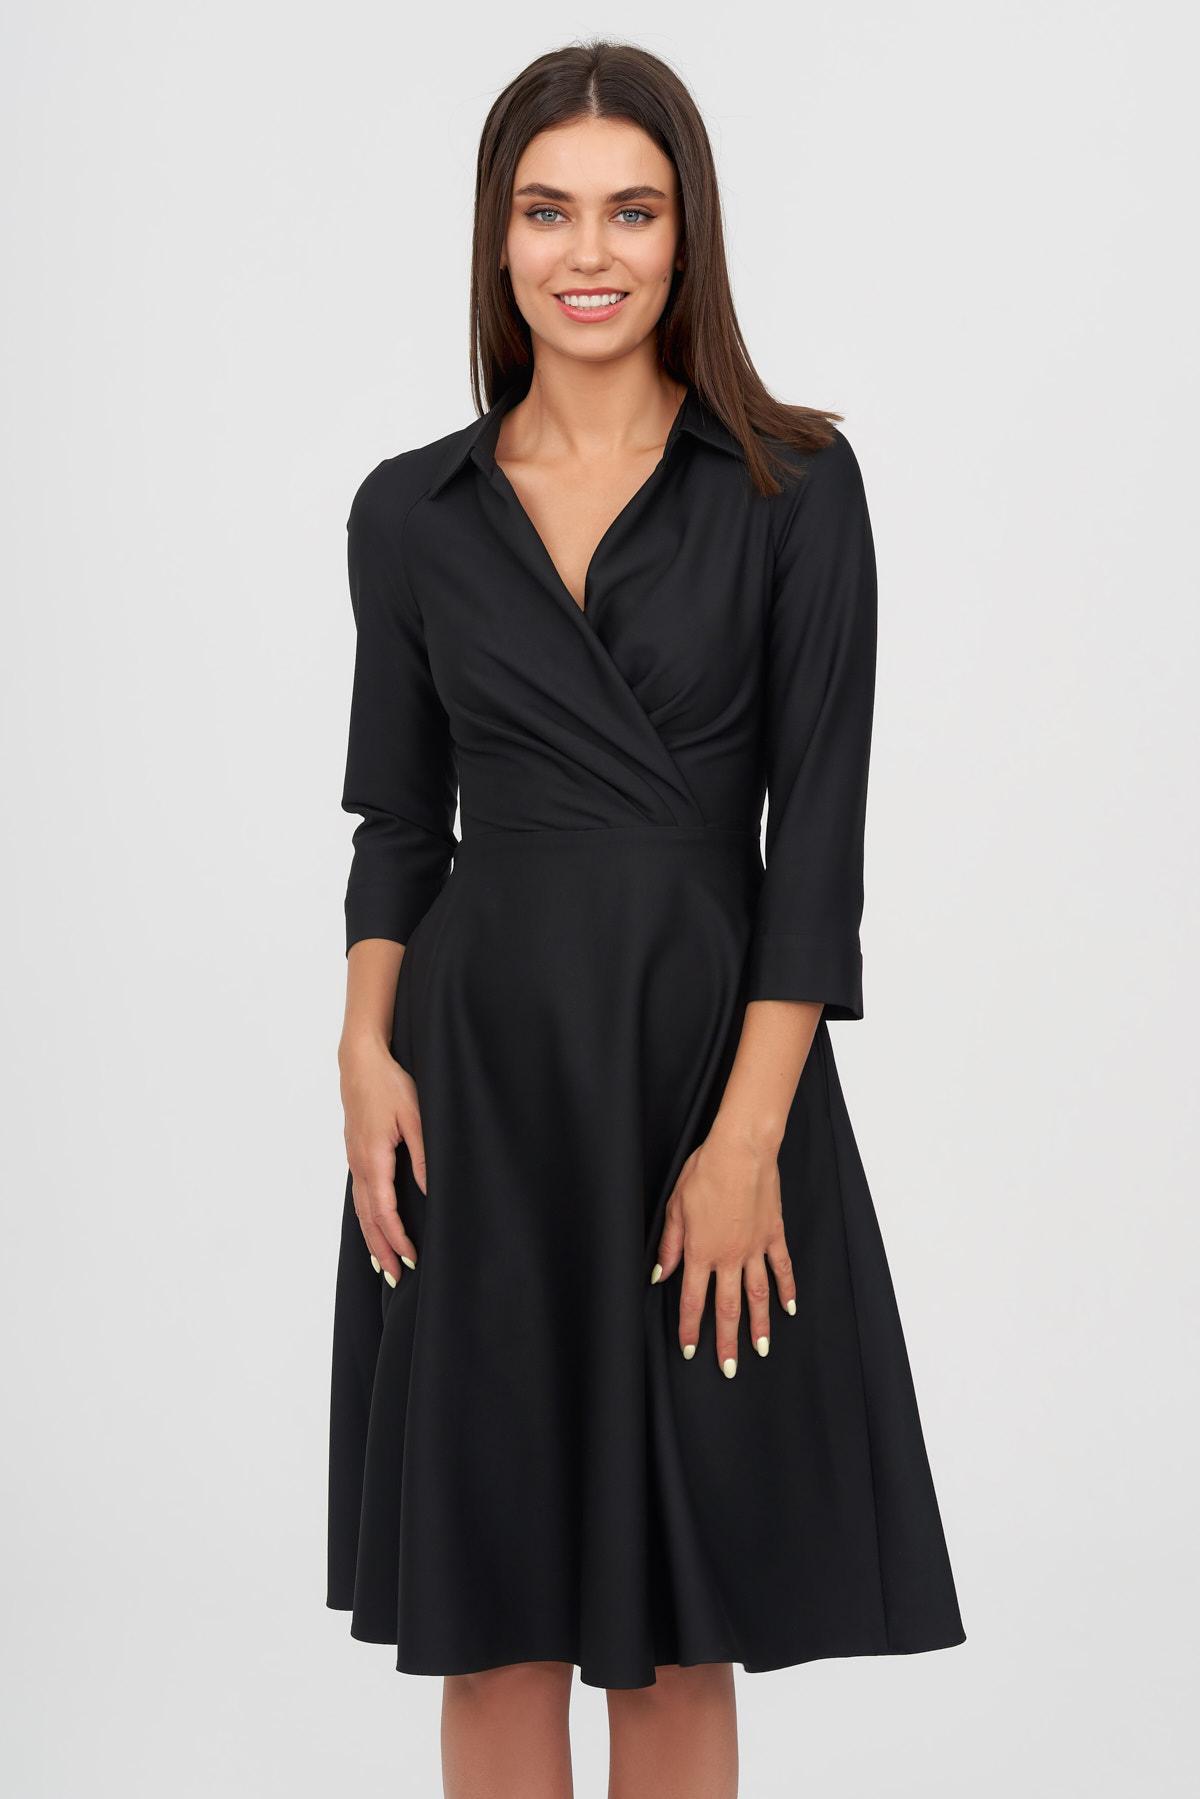 Платье женские Natali Bolgar модель 19069MAD49 характеристики, 2017